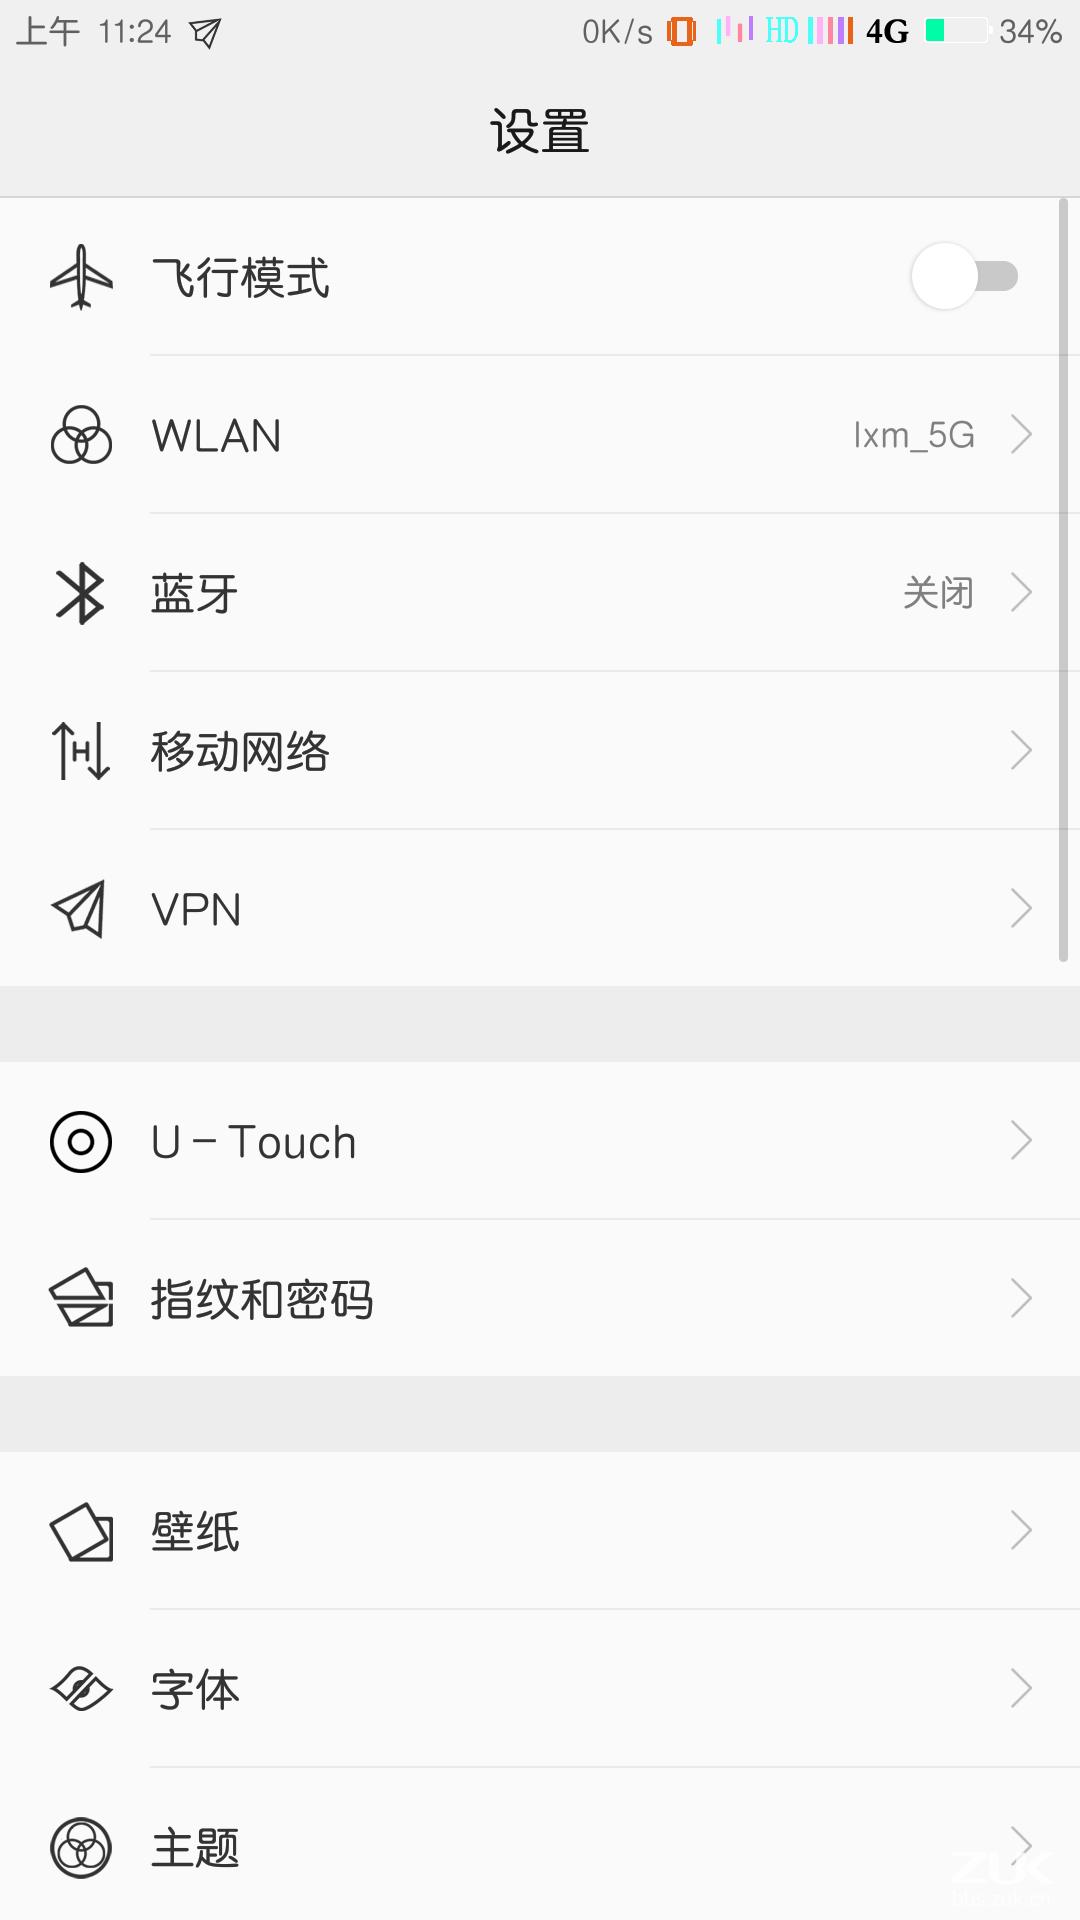 Screenshot_2016-12-04-11-24-01-0992771120.png